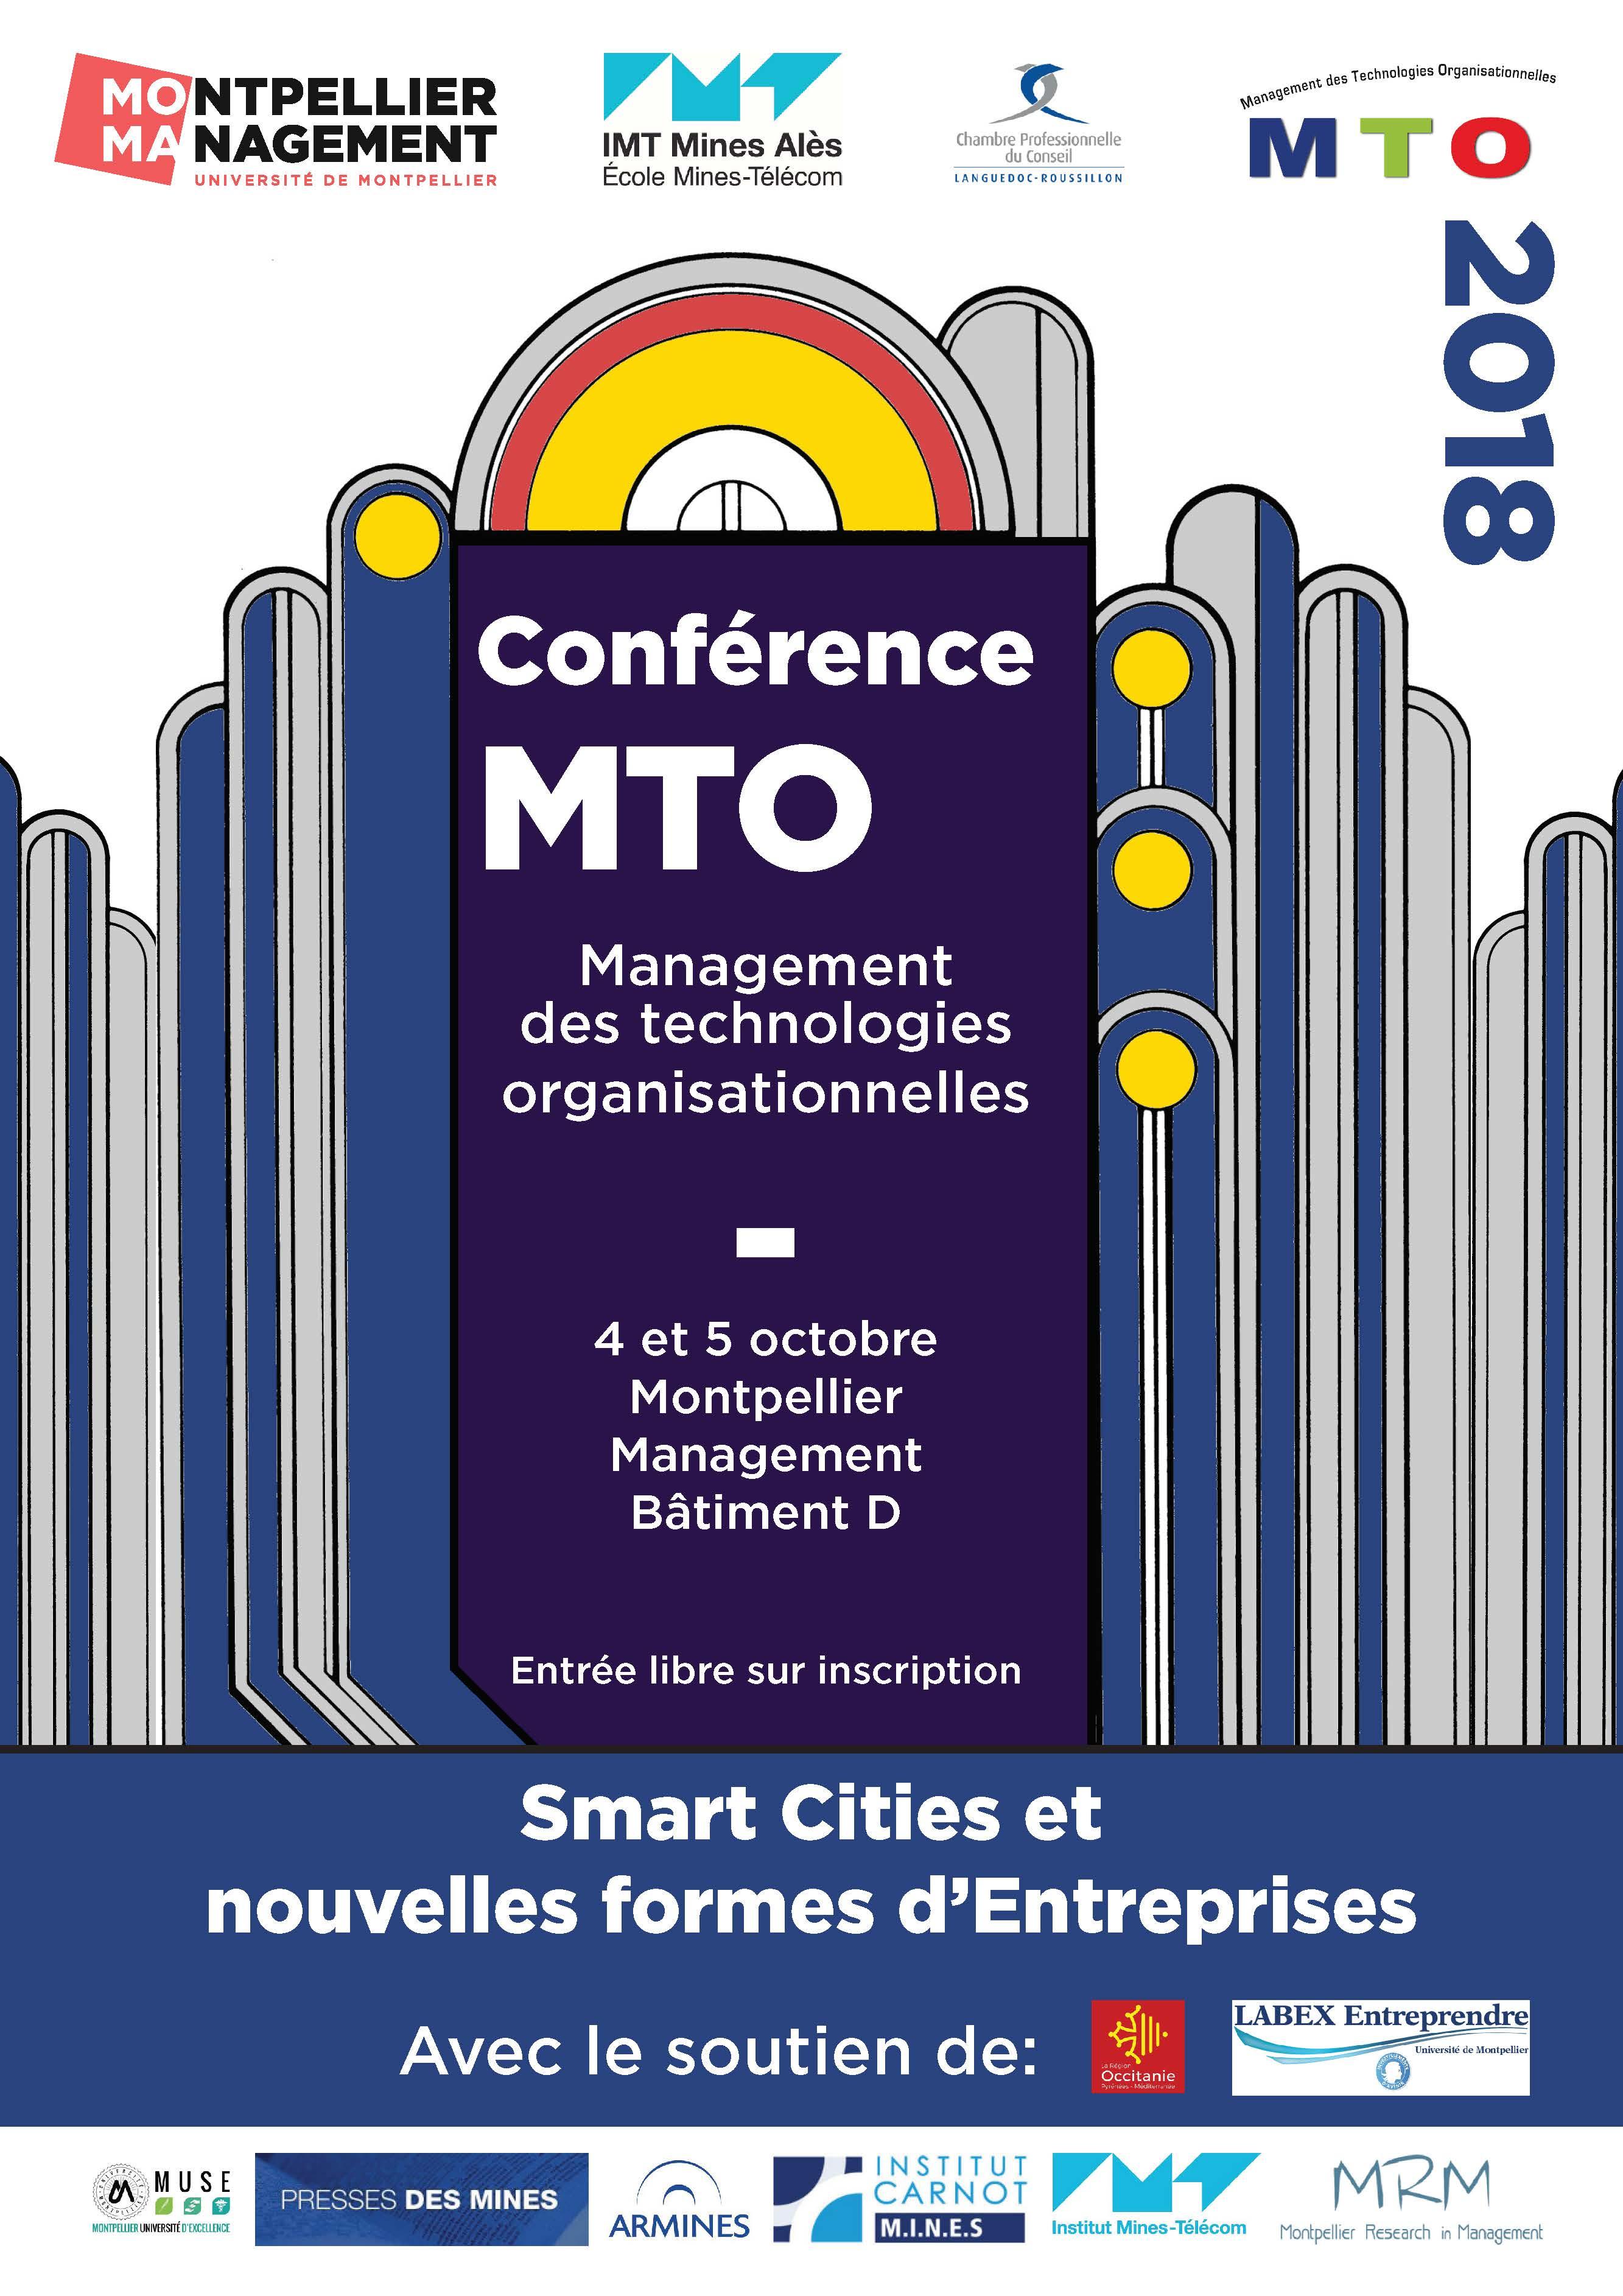 Affiche-Conference-MTO-Management-Technologies-Organisationnelles_Montpellier-Management_2018